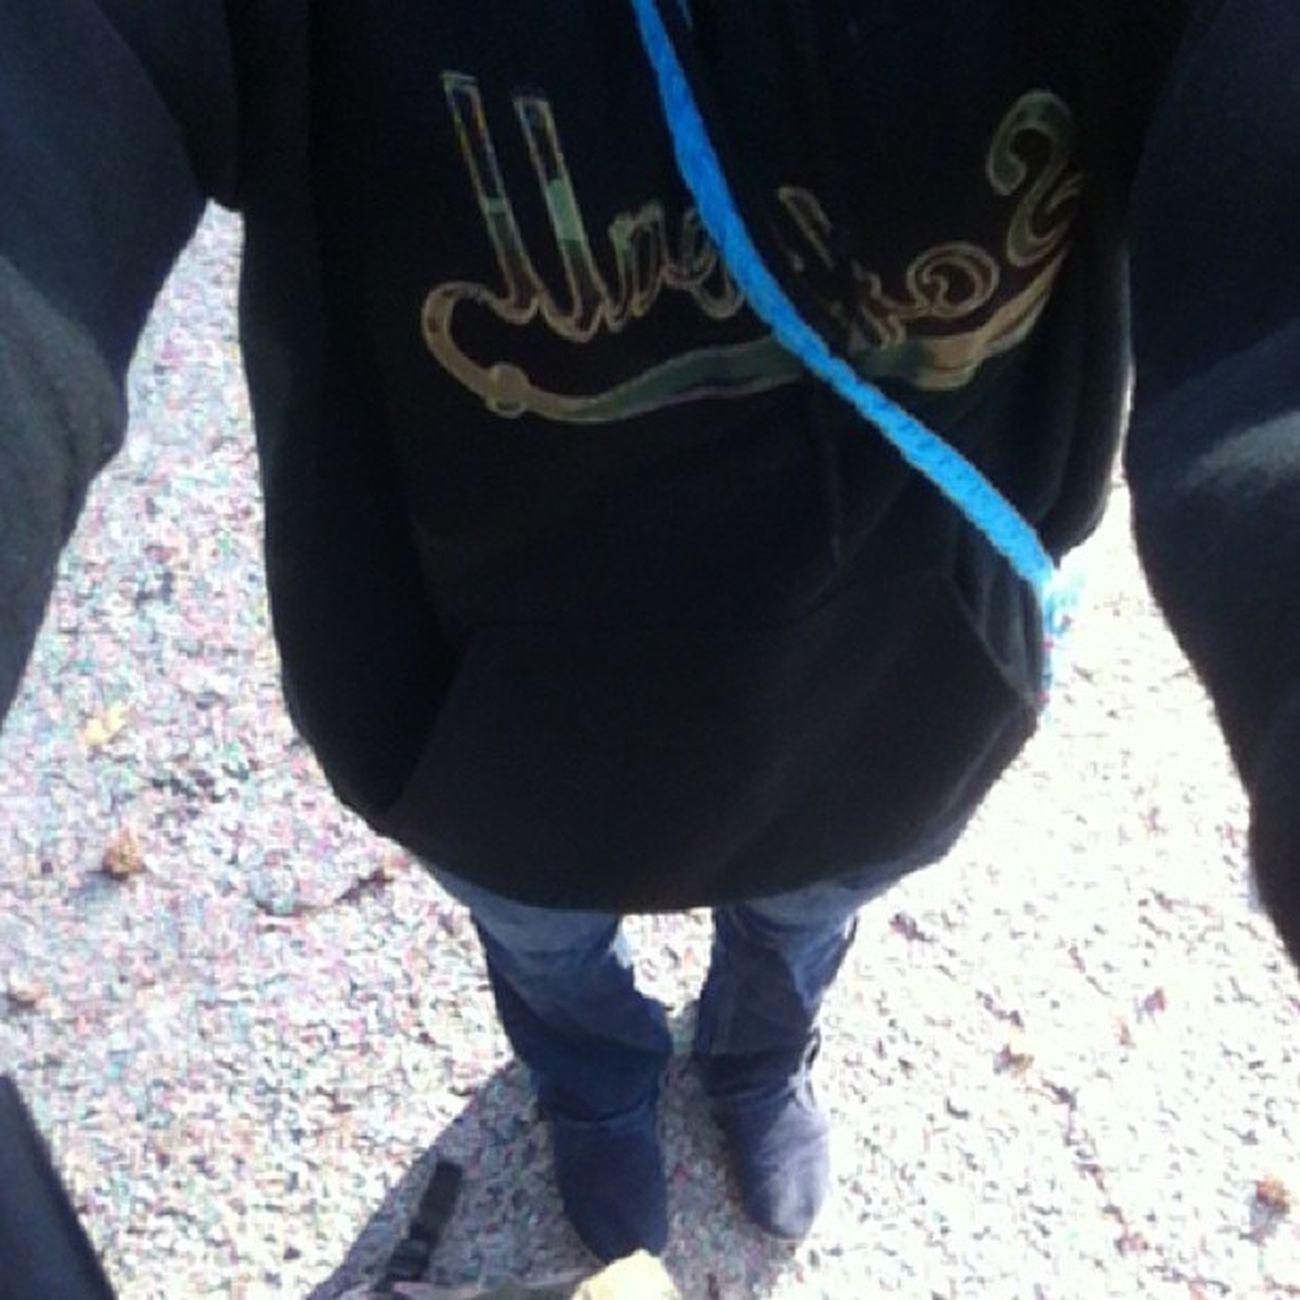 OOTD: jeans, tshirt, hoodie & bobs Dayfour Marchchallenge